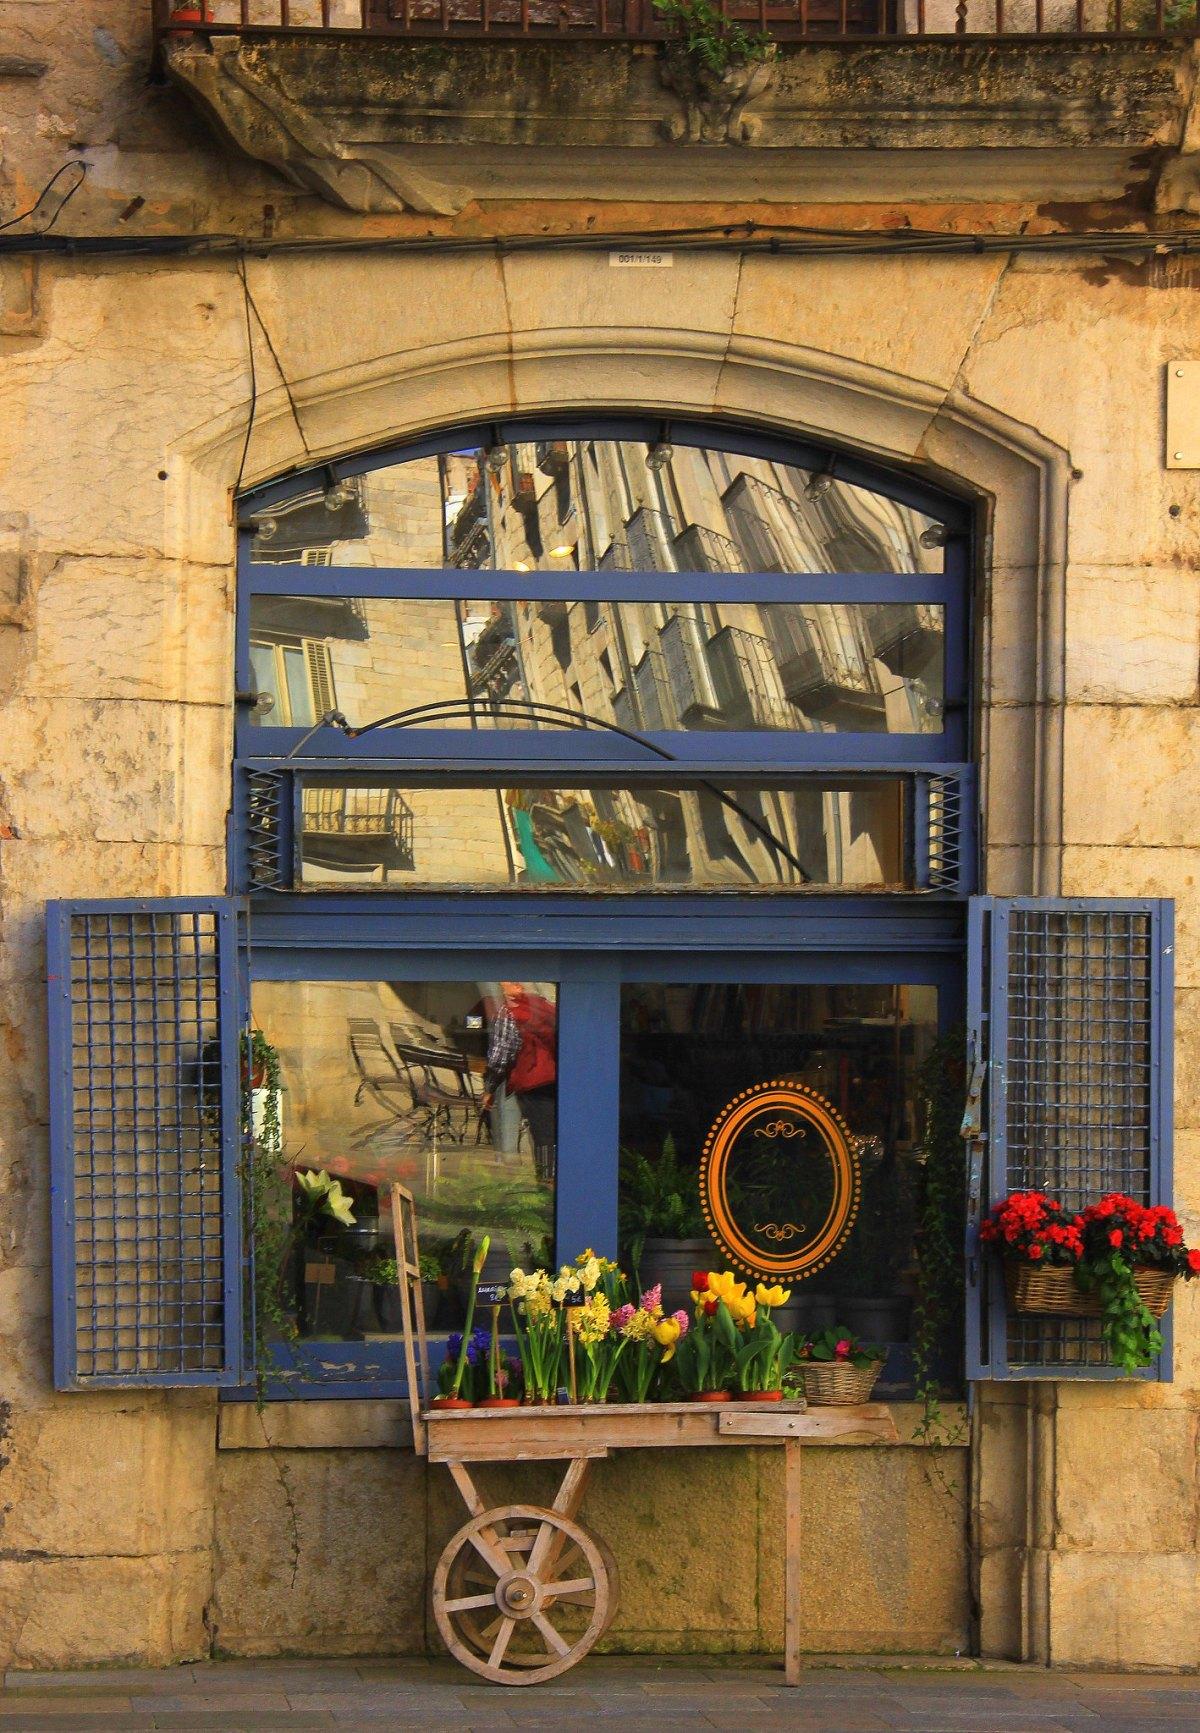 A shop window in Girona